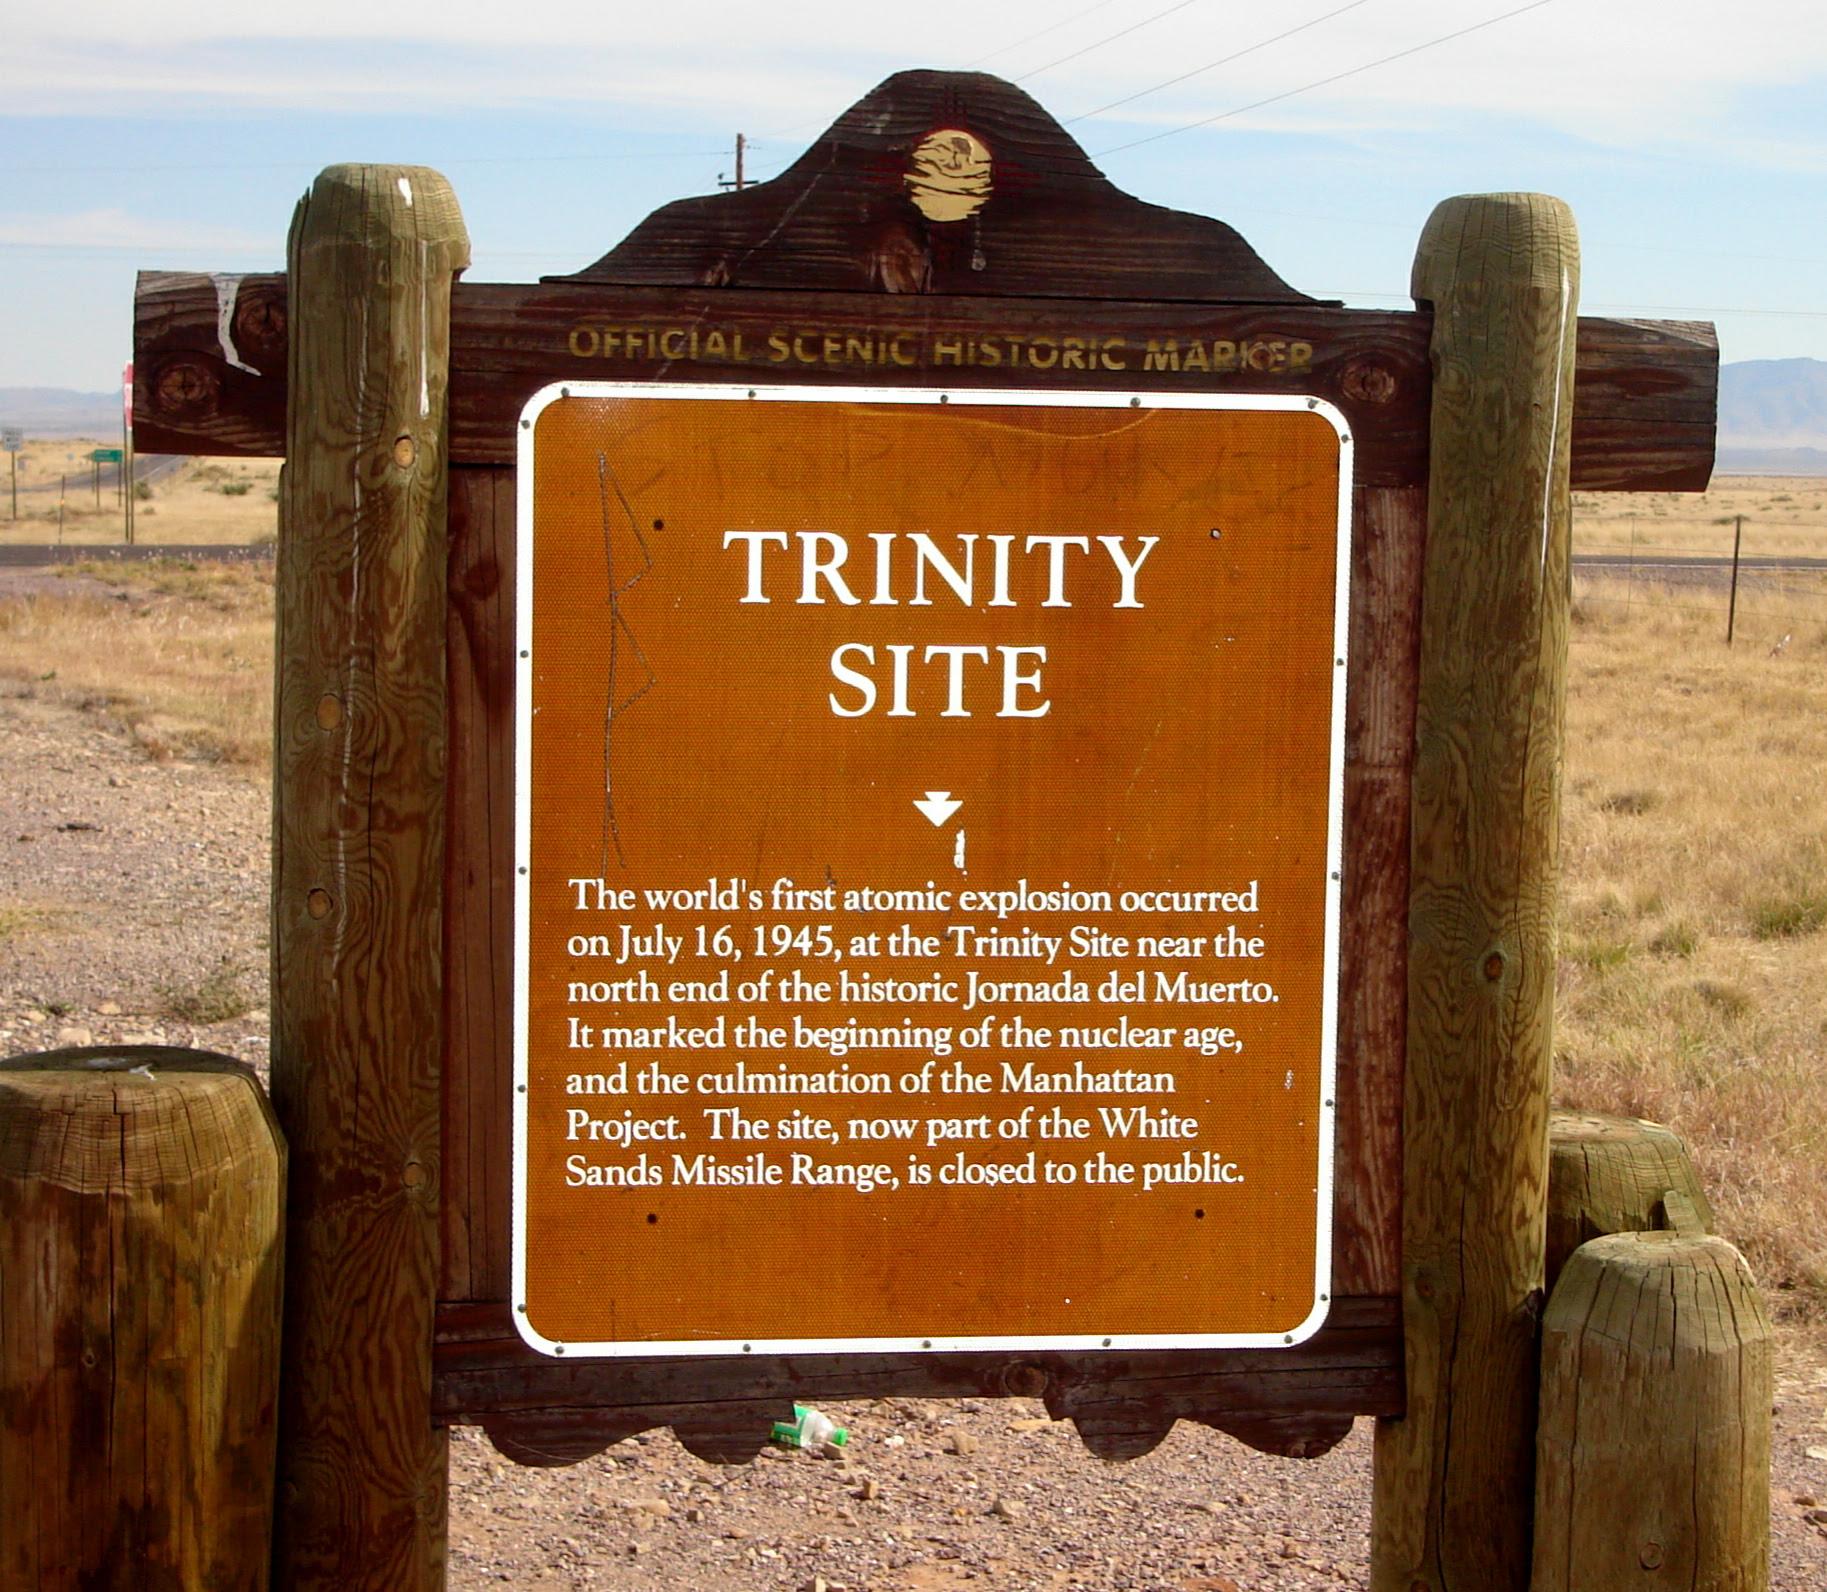 http://upload.wikimedia.org/wikipedia/commons/a/a9/TrinitySiteHistoricalMarkerHighwaySign.jpg